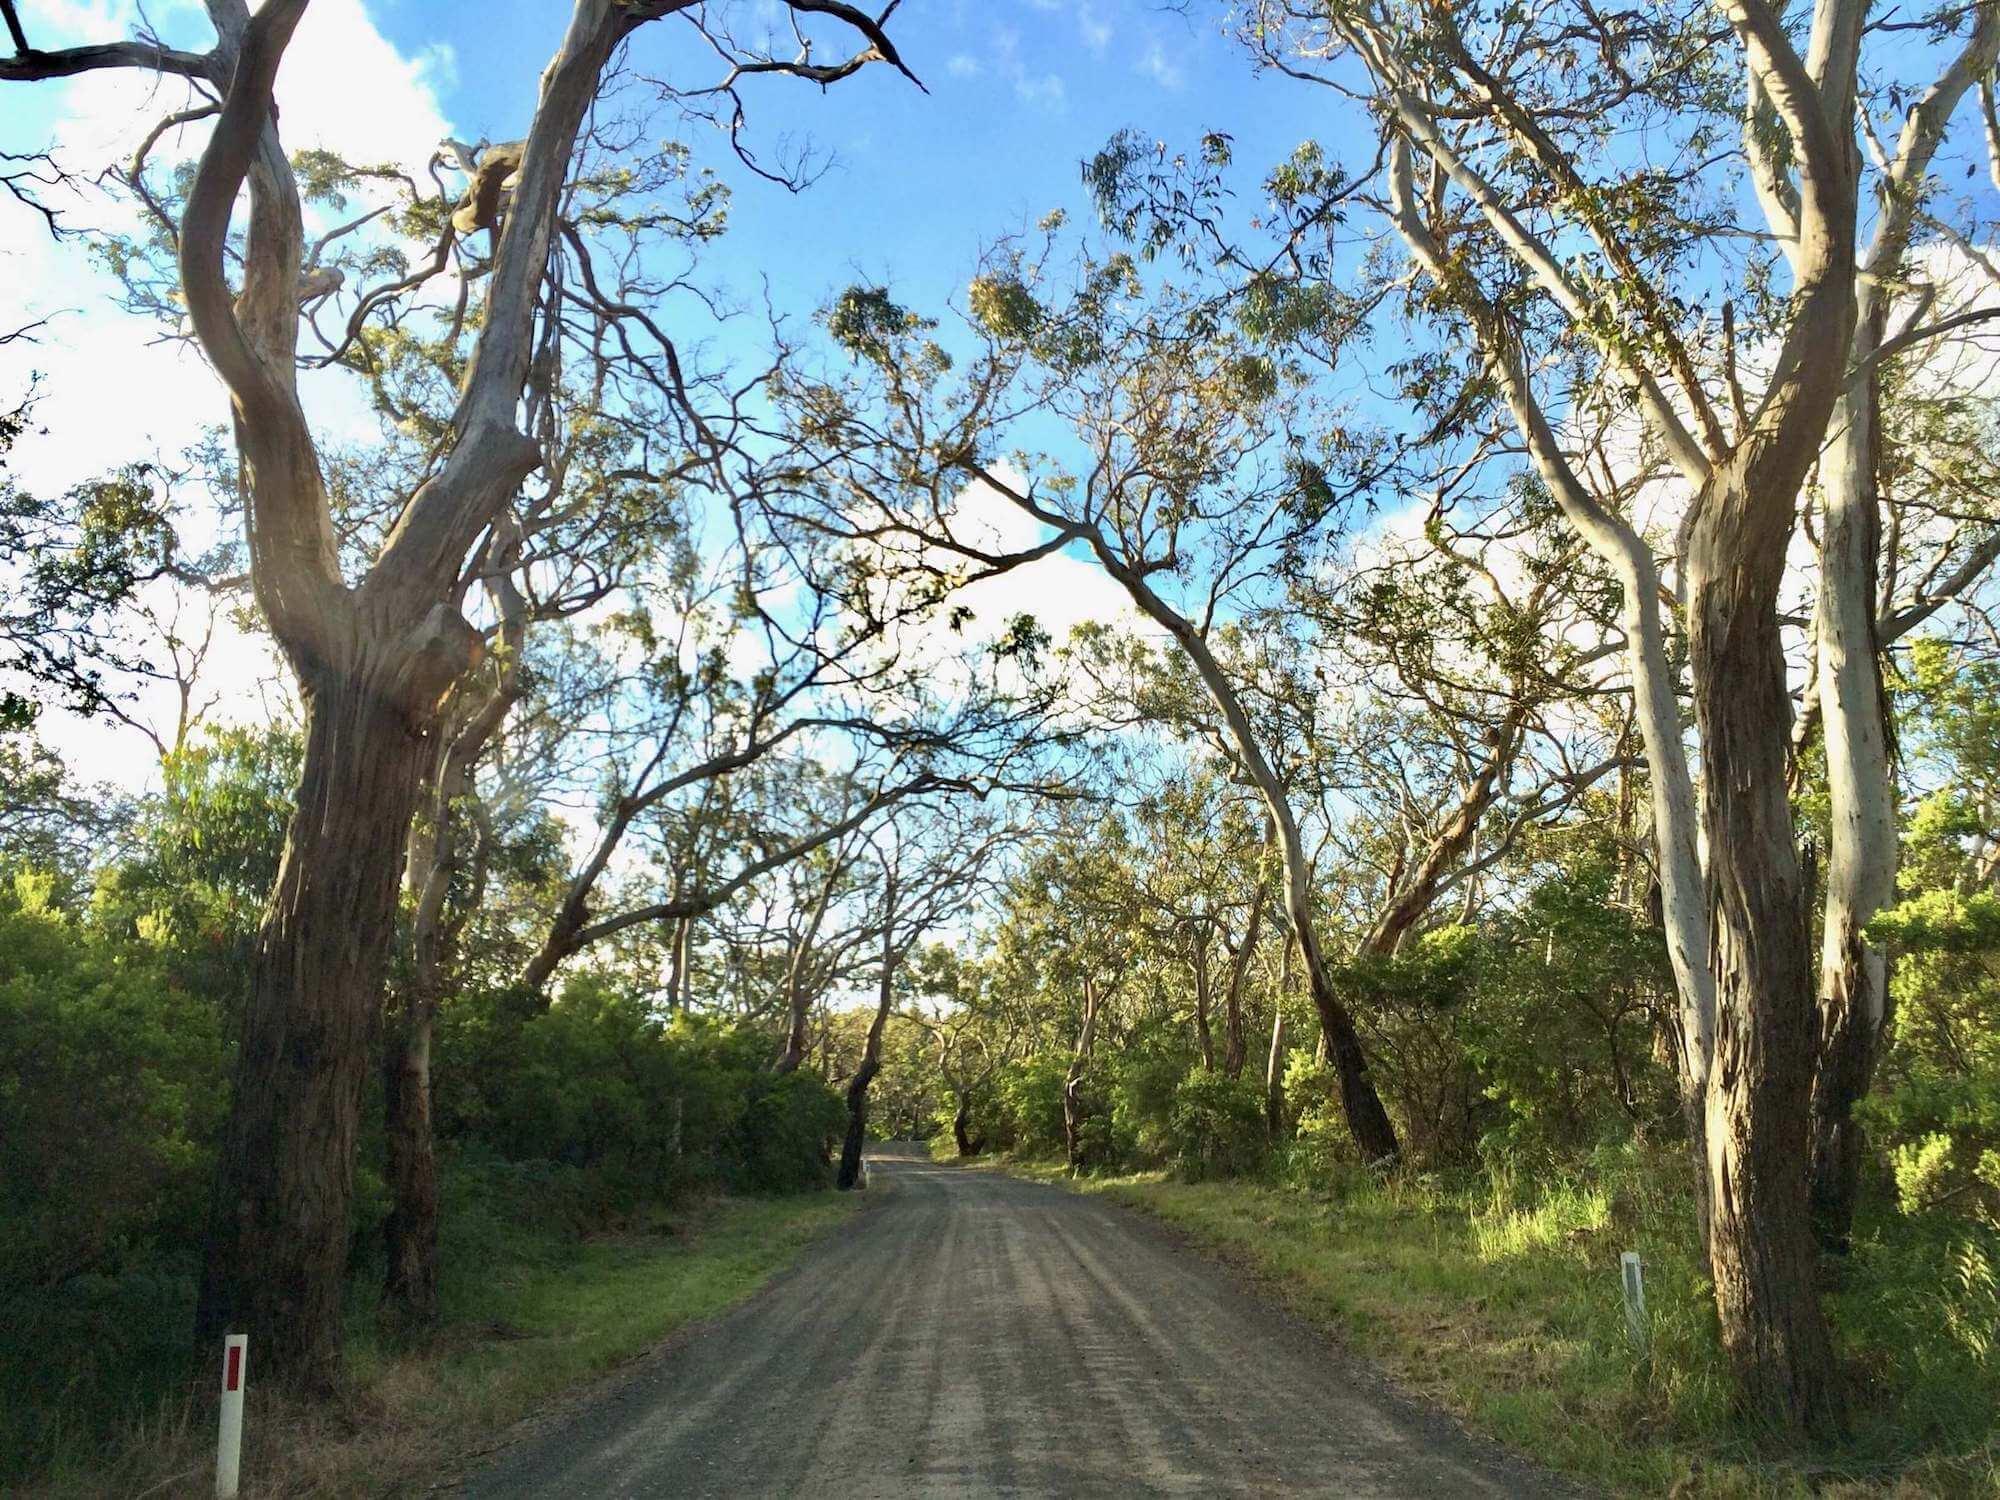 Entrance to Bimbi Park, Australia